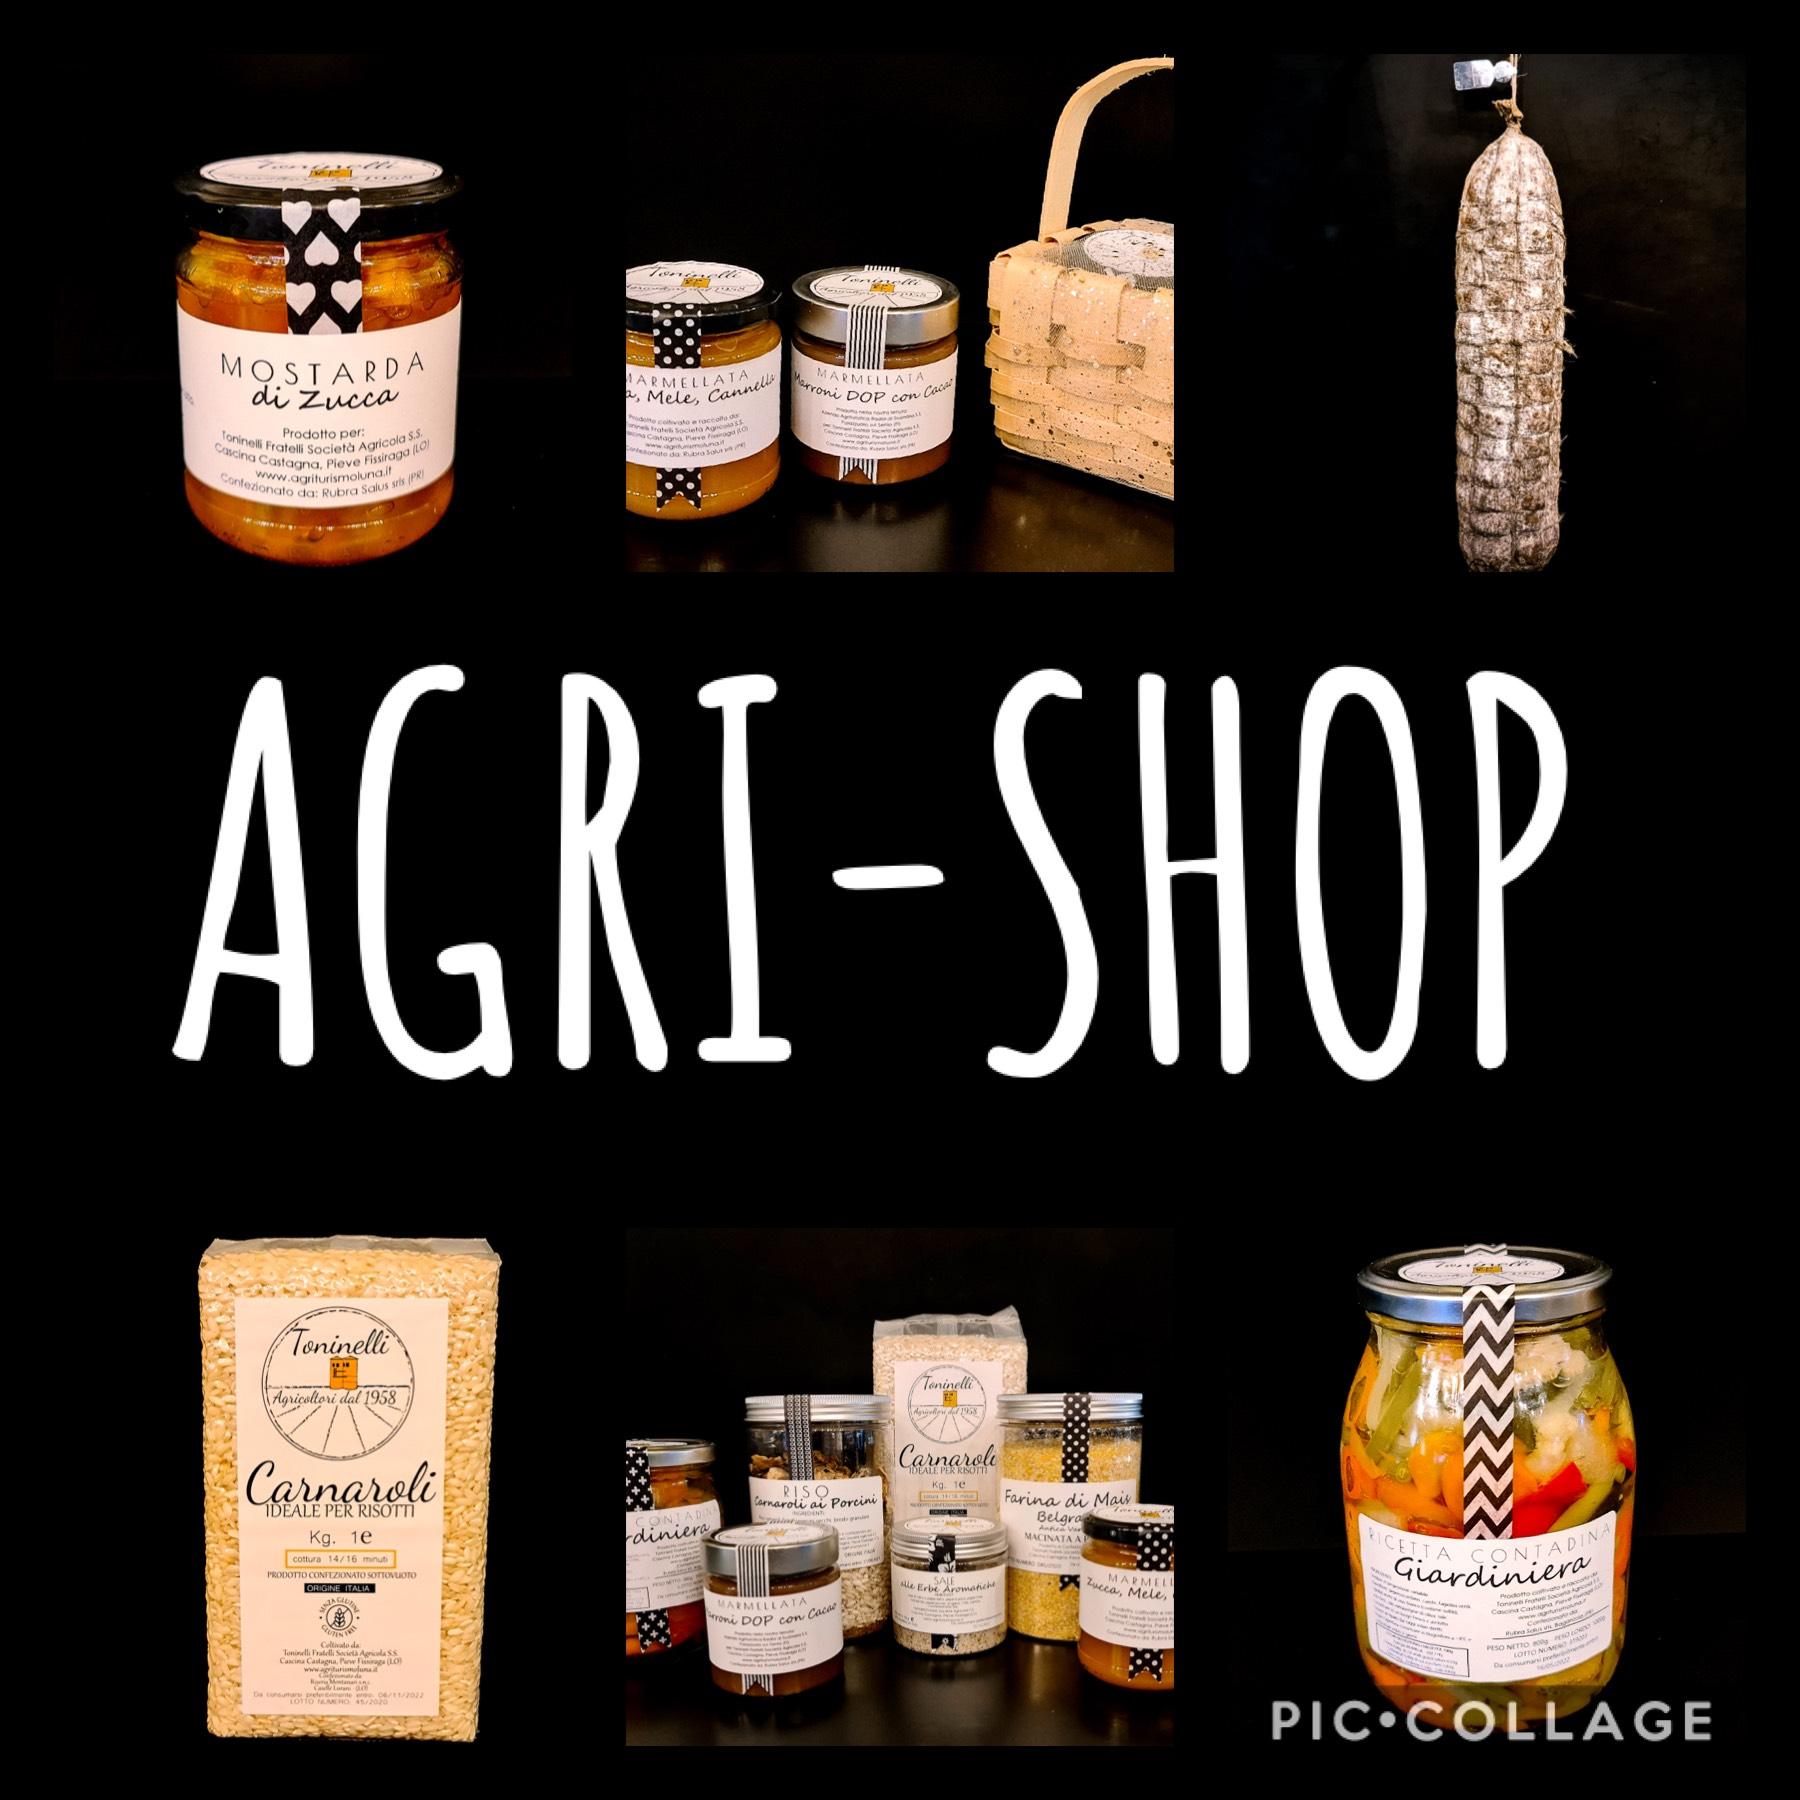 agri-shop